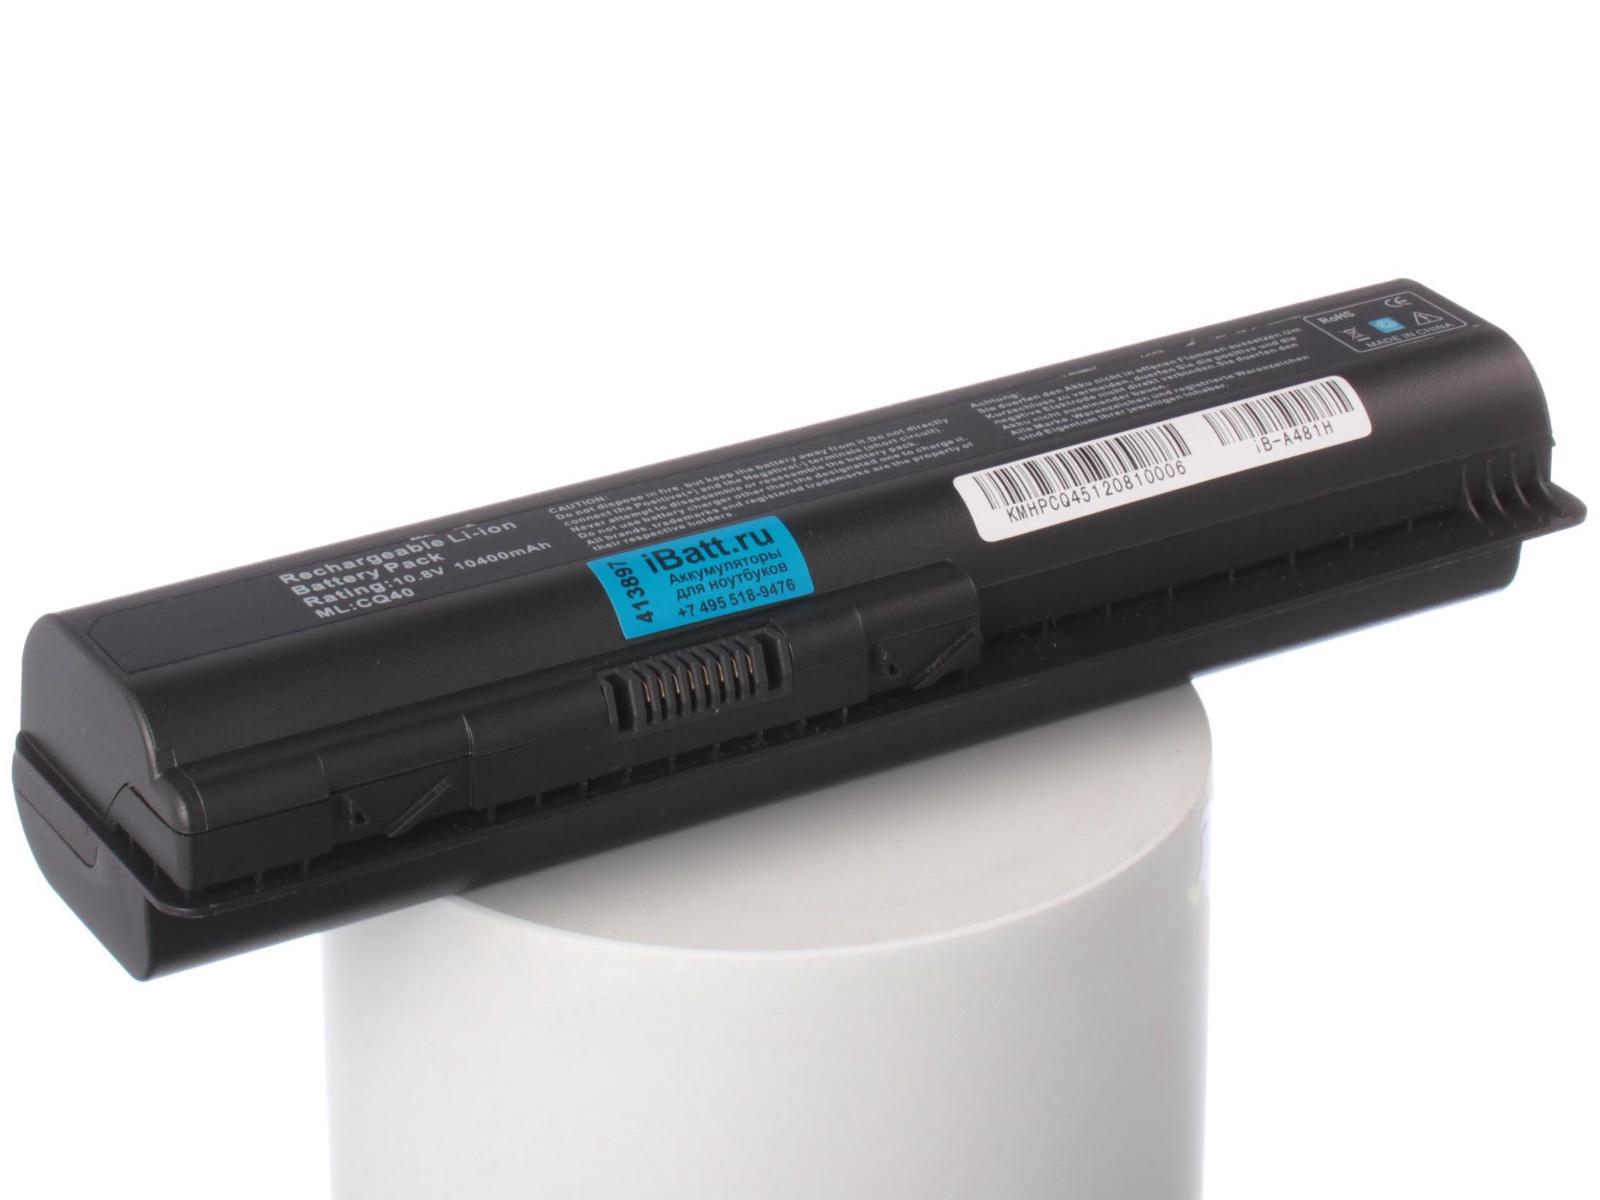 Аккумулятор для ноутбука iBatt для HP-Compaq Presario CQ61-200SP, Presario CQ71-210ER, G60-237NR, G60-445DX, G70-250US, Pavilion dv5-1100, Pavilion dv5-1111ea, Pavilion dv6-1140EG, Pavilion dv6-1199EG, Pavilion dv6-2030ER аккумулятор для ноутбука hp compaq hstnn lb12 hstnn ib12 hstnn c02c hstnn ub12 hstnn ib27 nc4200 nc4400 tc4200 6cell tc4400 hstnn ib12